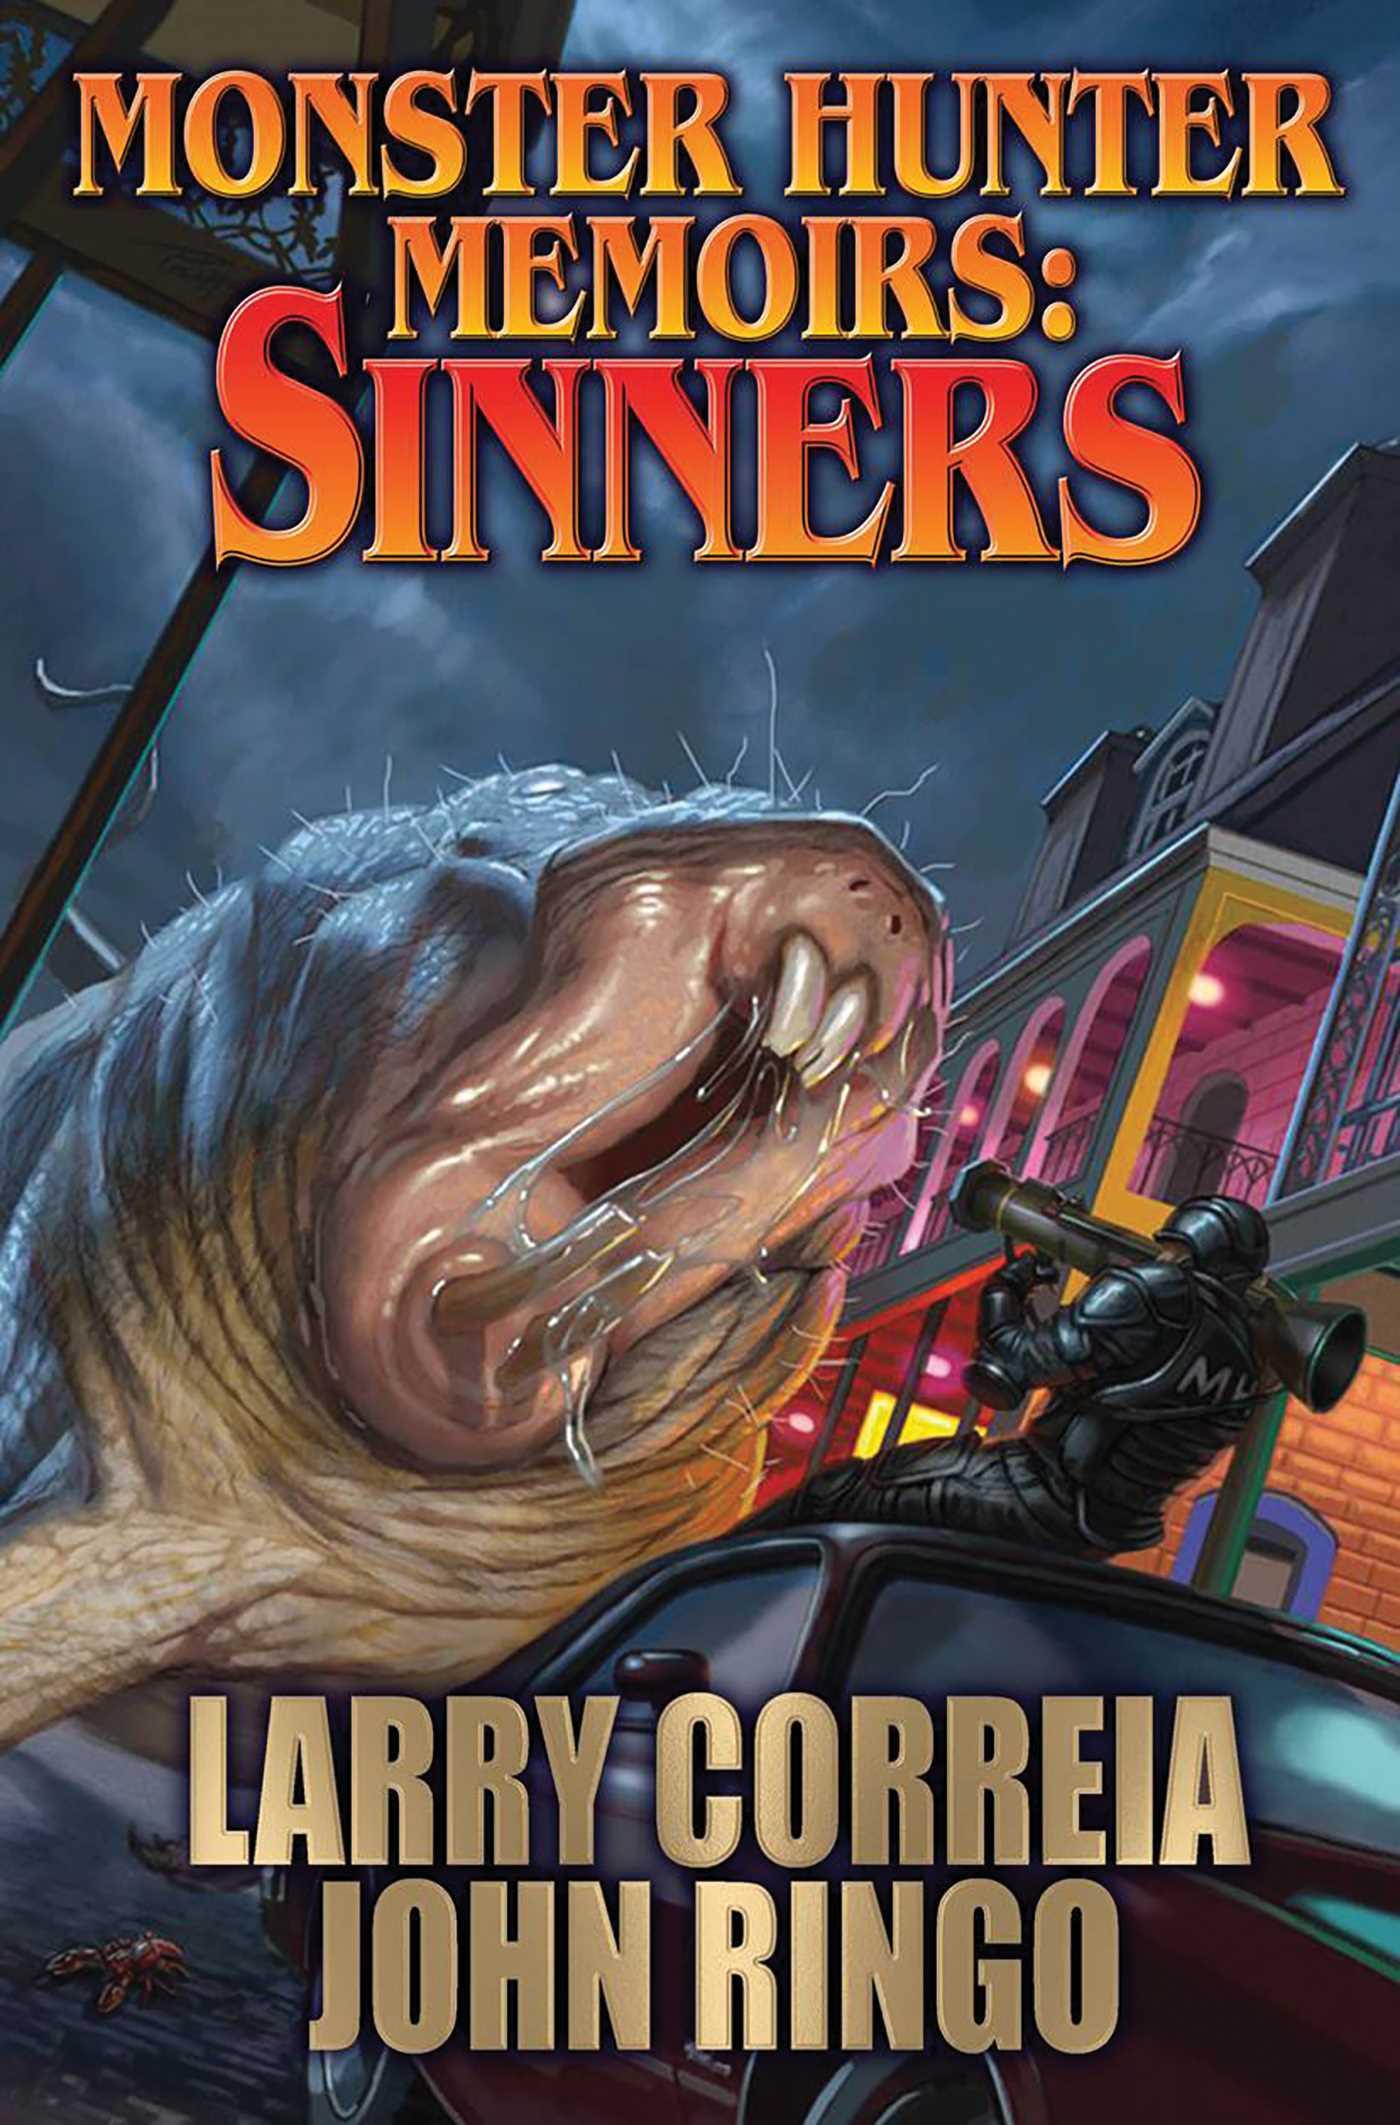 Monster hunter memoirs sinners 9781481482875 hr